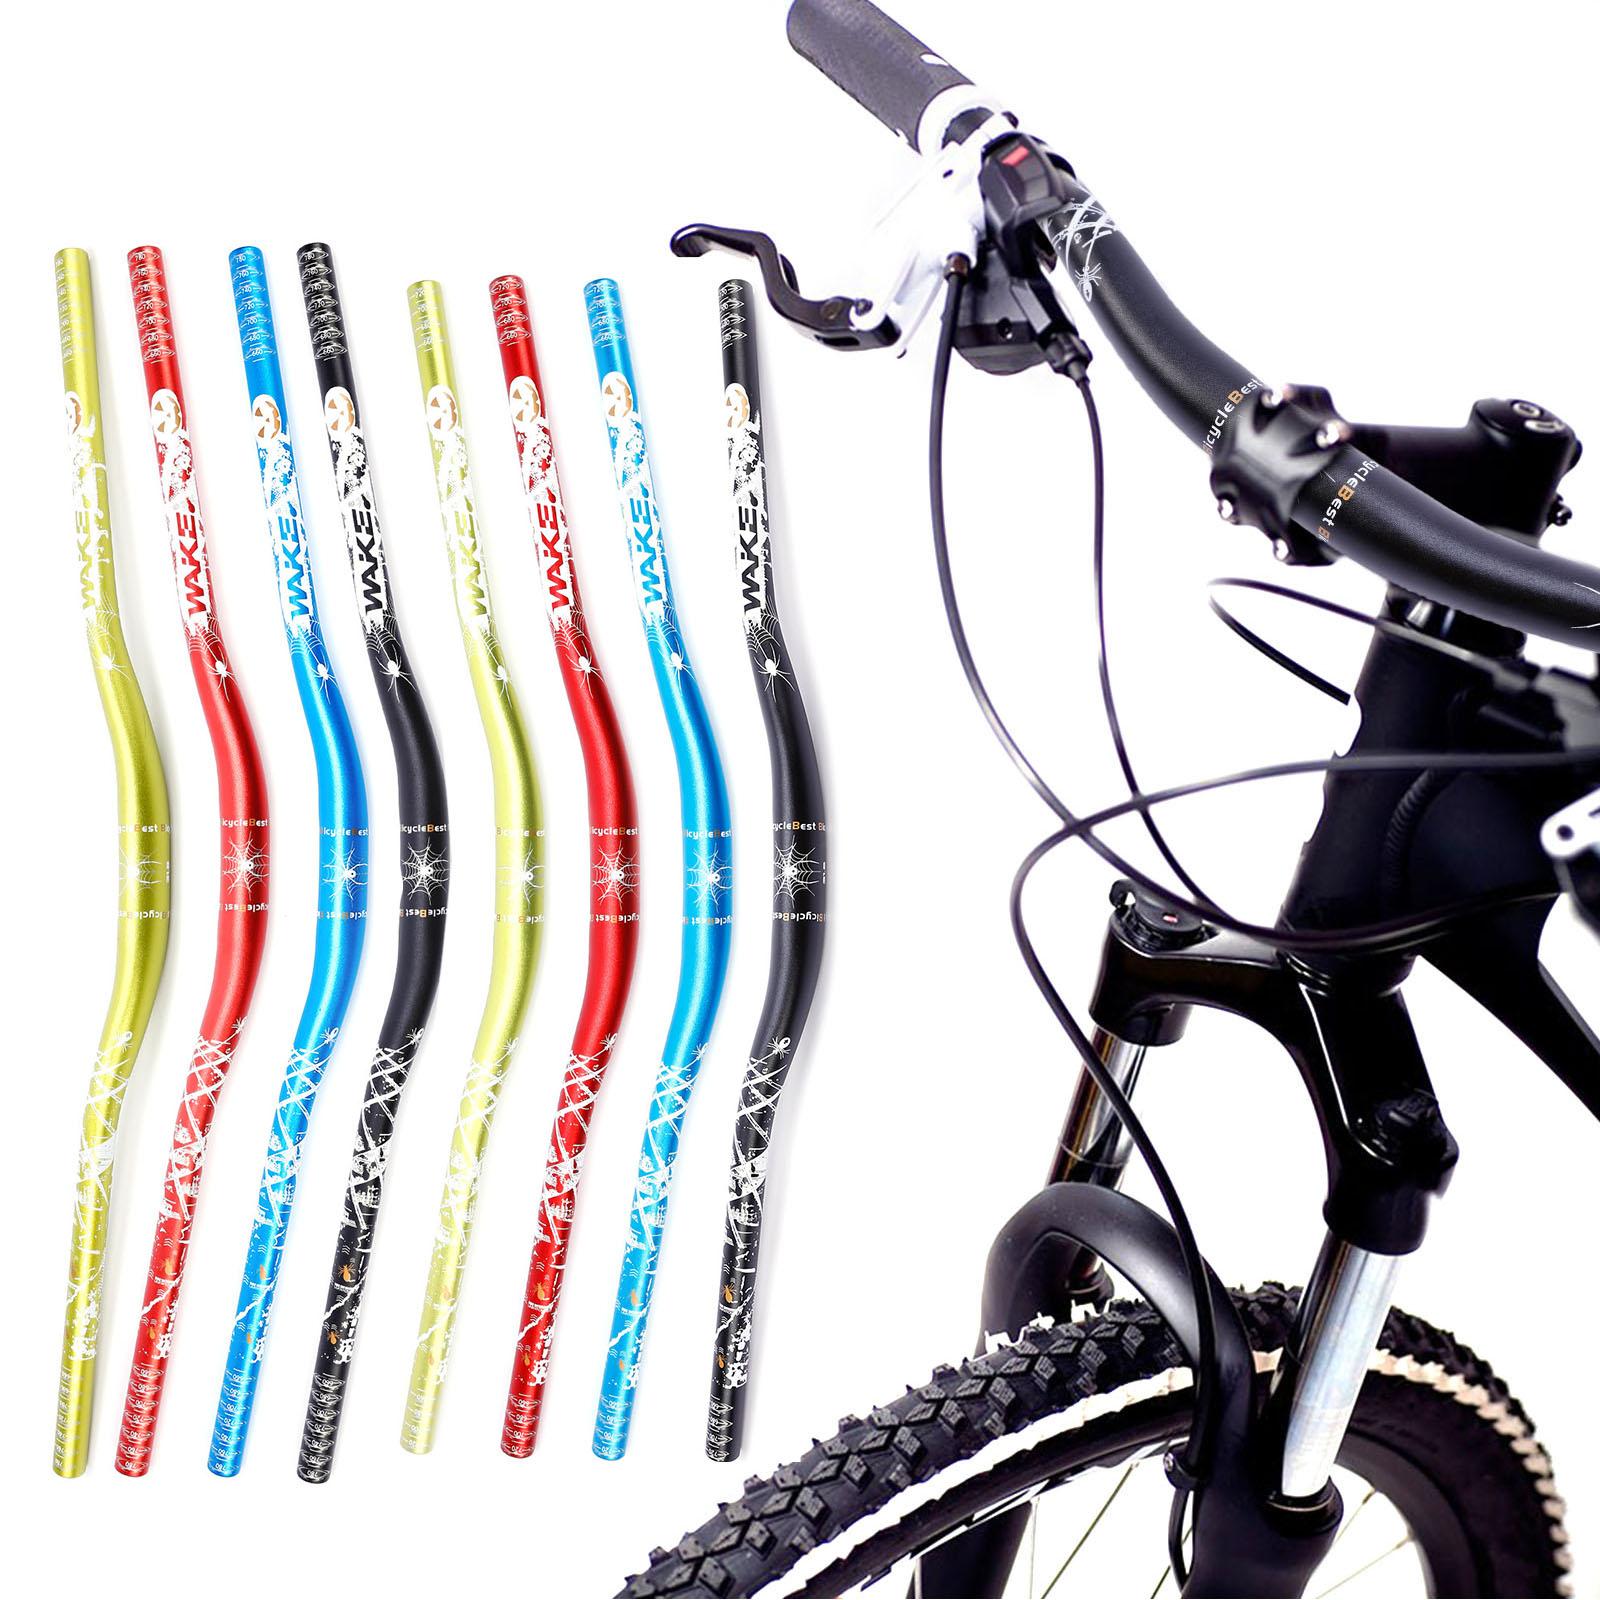 Alu Downhill Fahrrad MTB Lenker Riser Trekking 31.8mm 620mm Schwarz Rot Blau